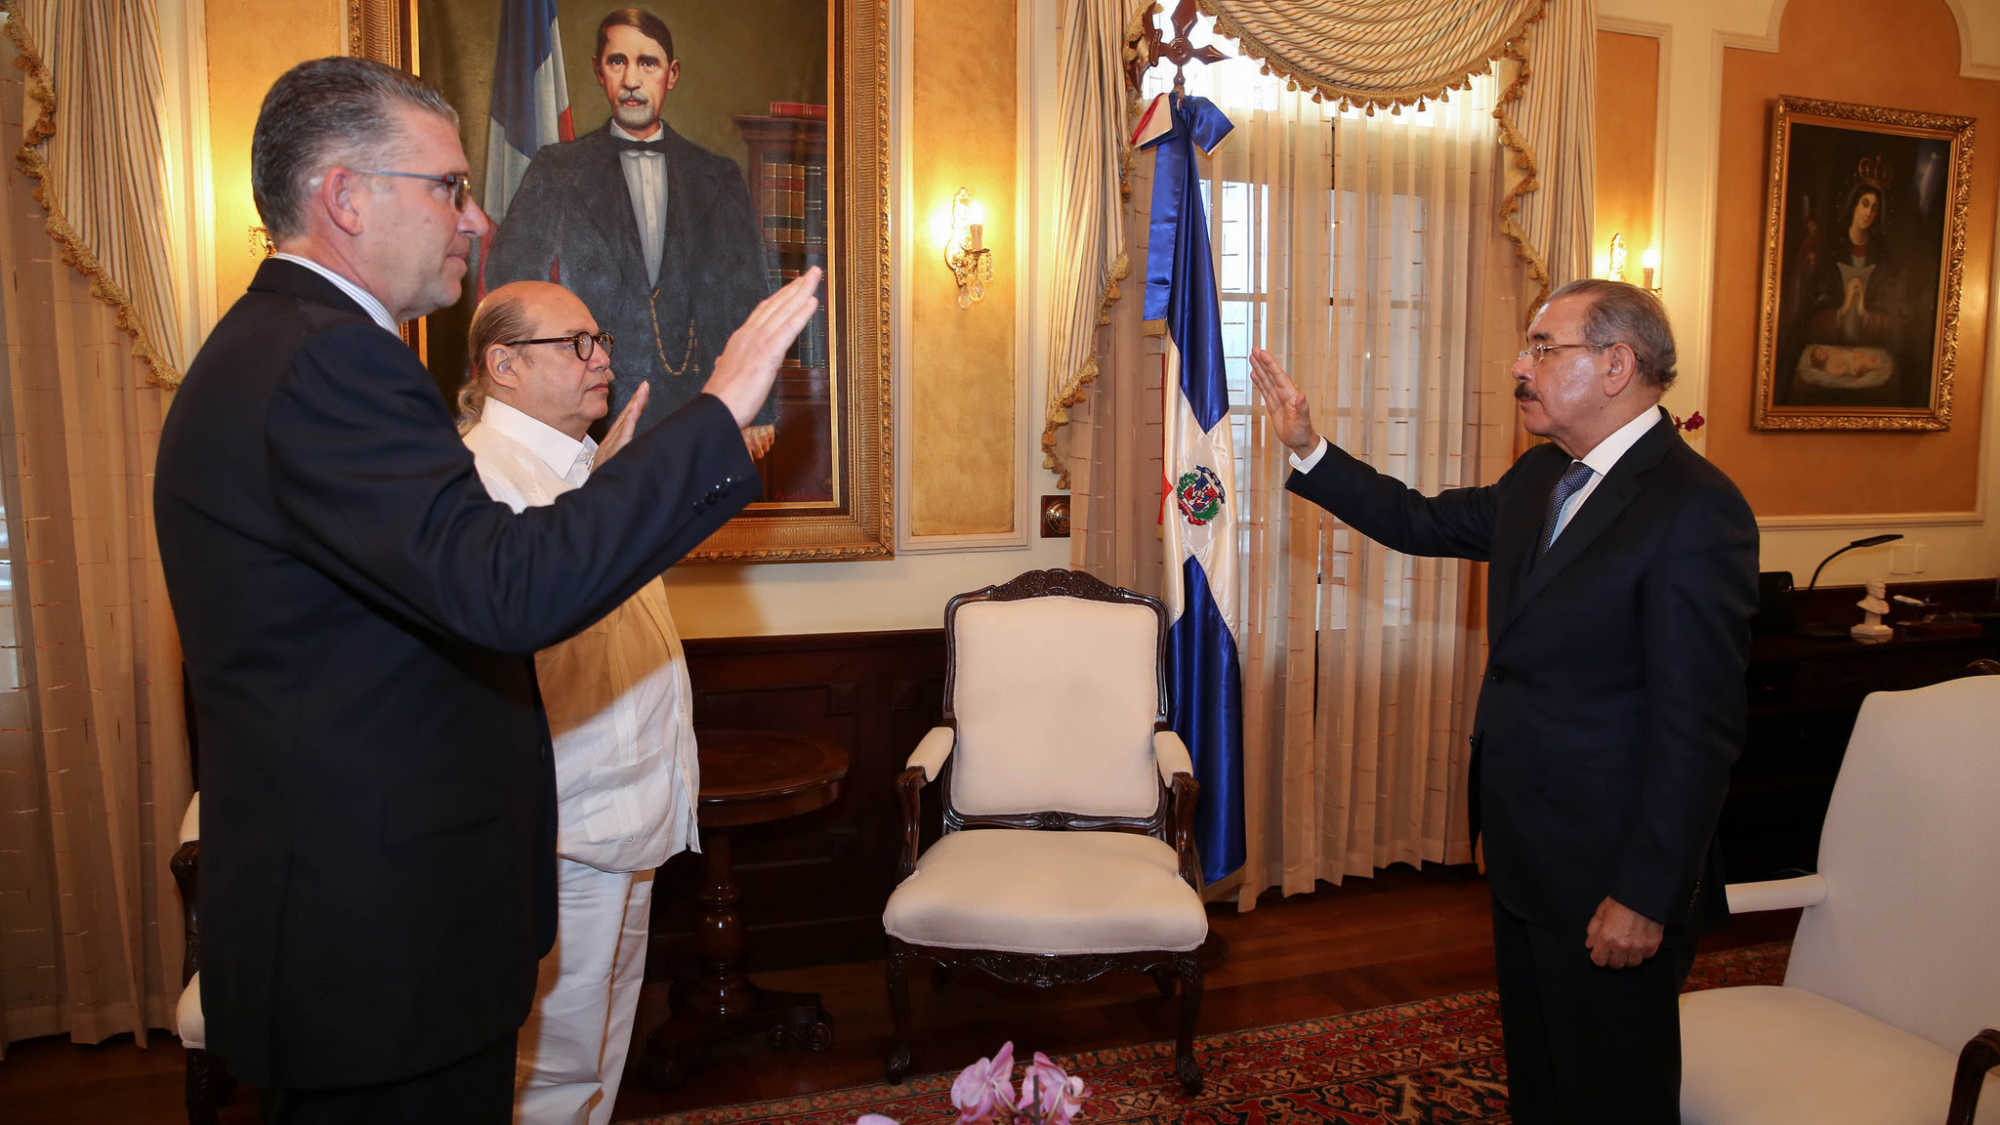 Presidente Danilo Medina juramenta a Víctor Víctor y Eric Rivero